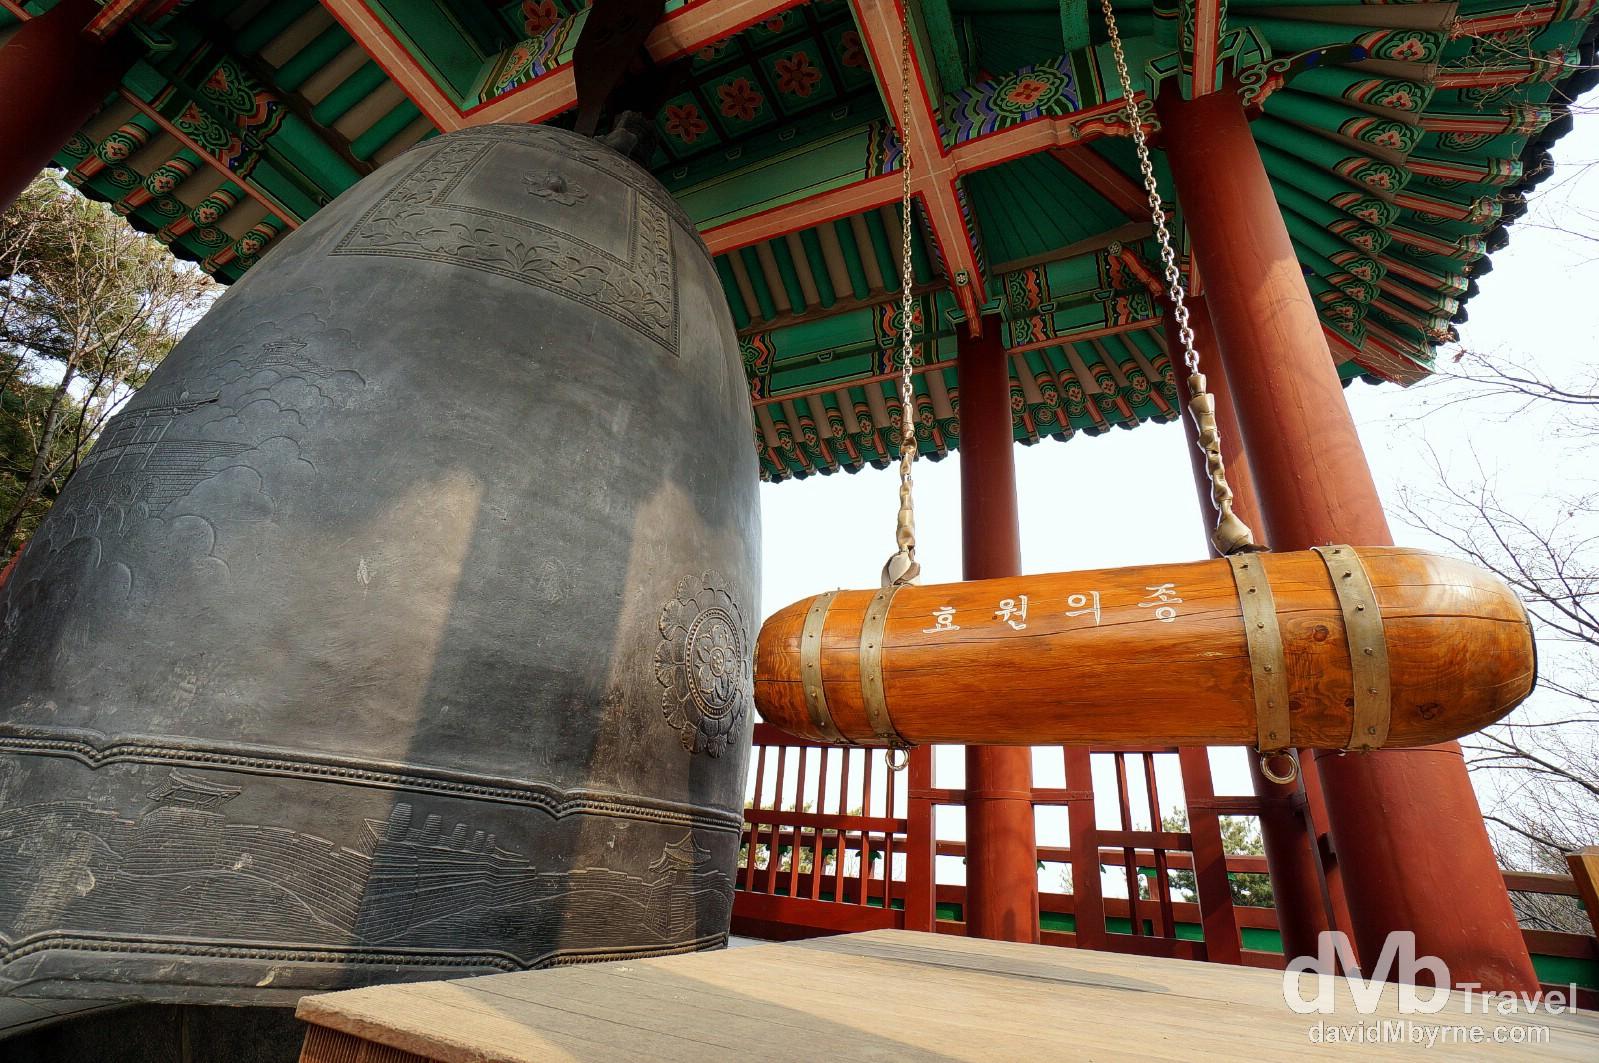 The Bell of Hyowon of Suwon Hwaseong Fortress, Suwon, South Korea. February 23rd, 2014.